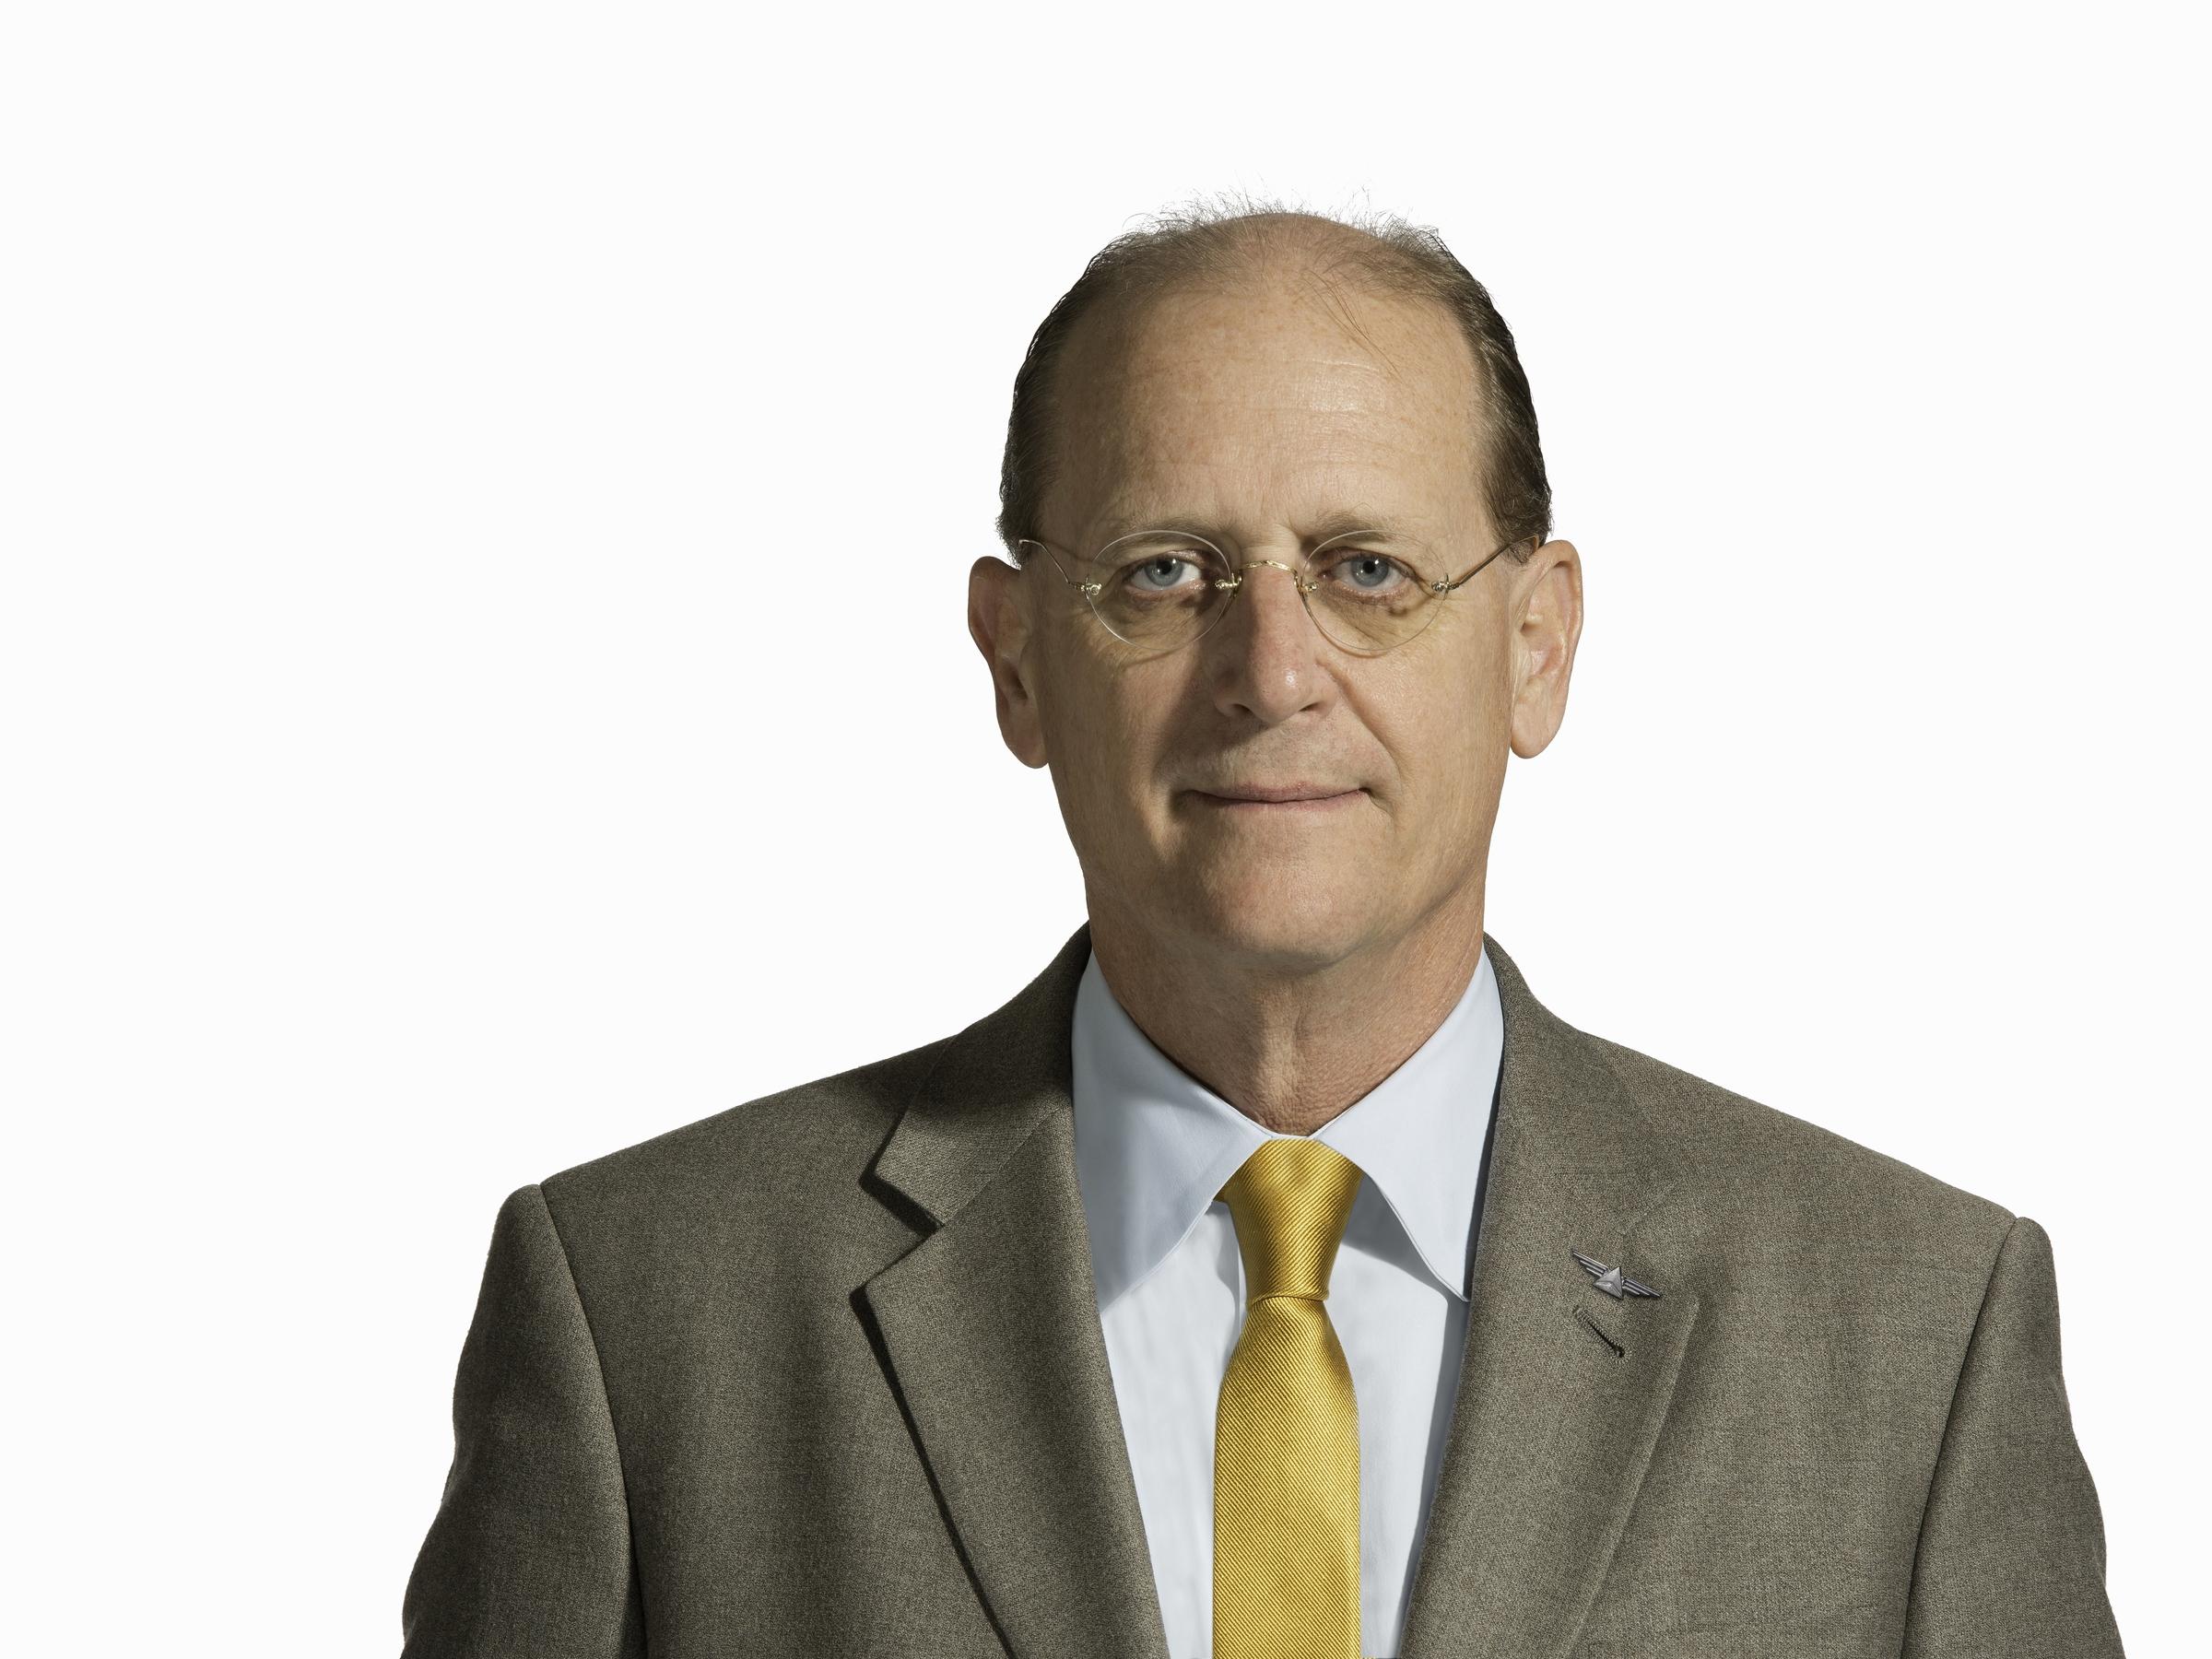 RichardAnderson